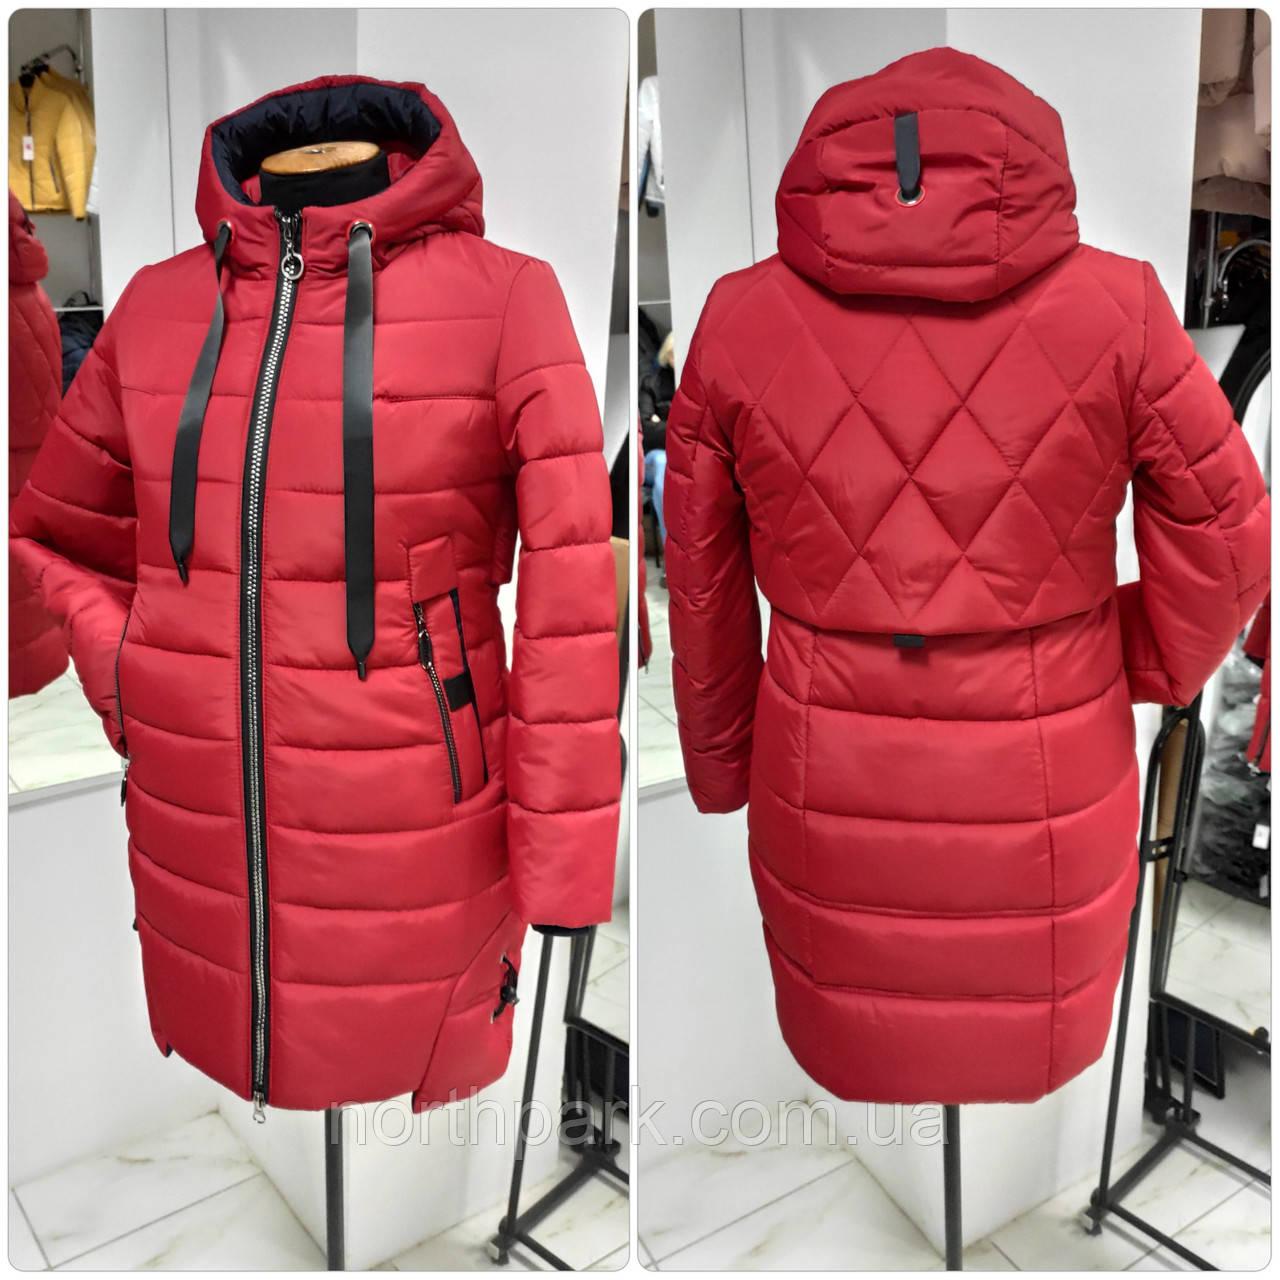 Длинная зимняя женская куртка Edem-310, размер 50